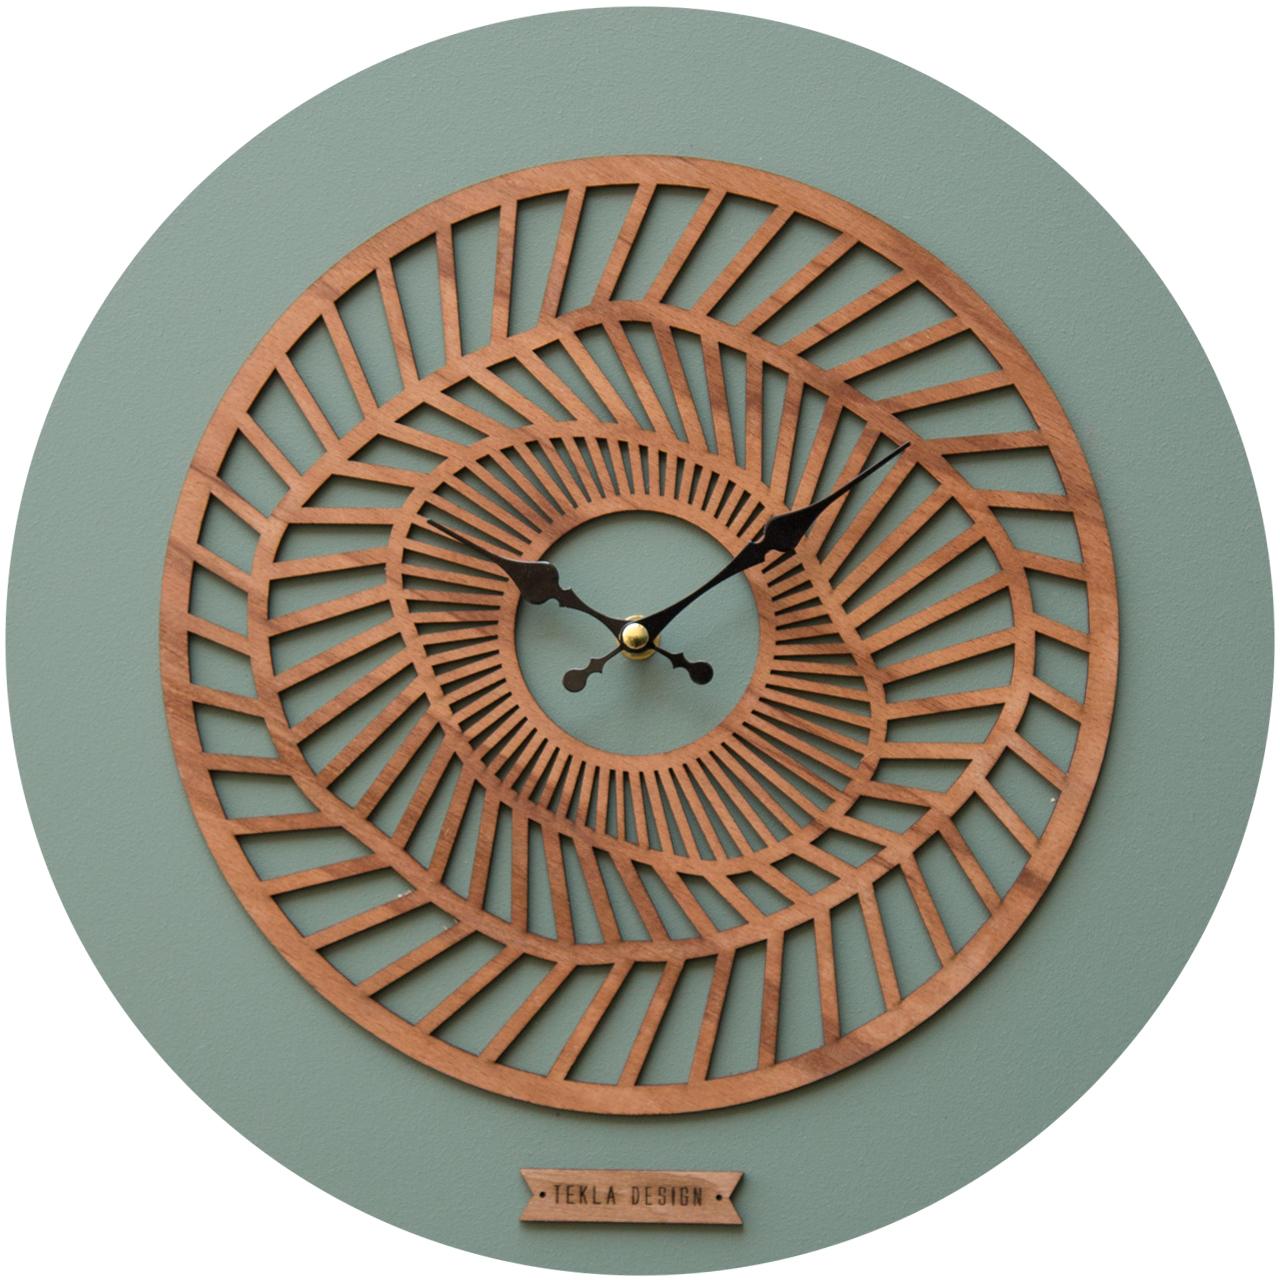 ساعت دیواری تکلا دیزاین مدل TT209